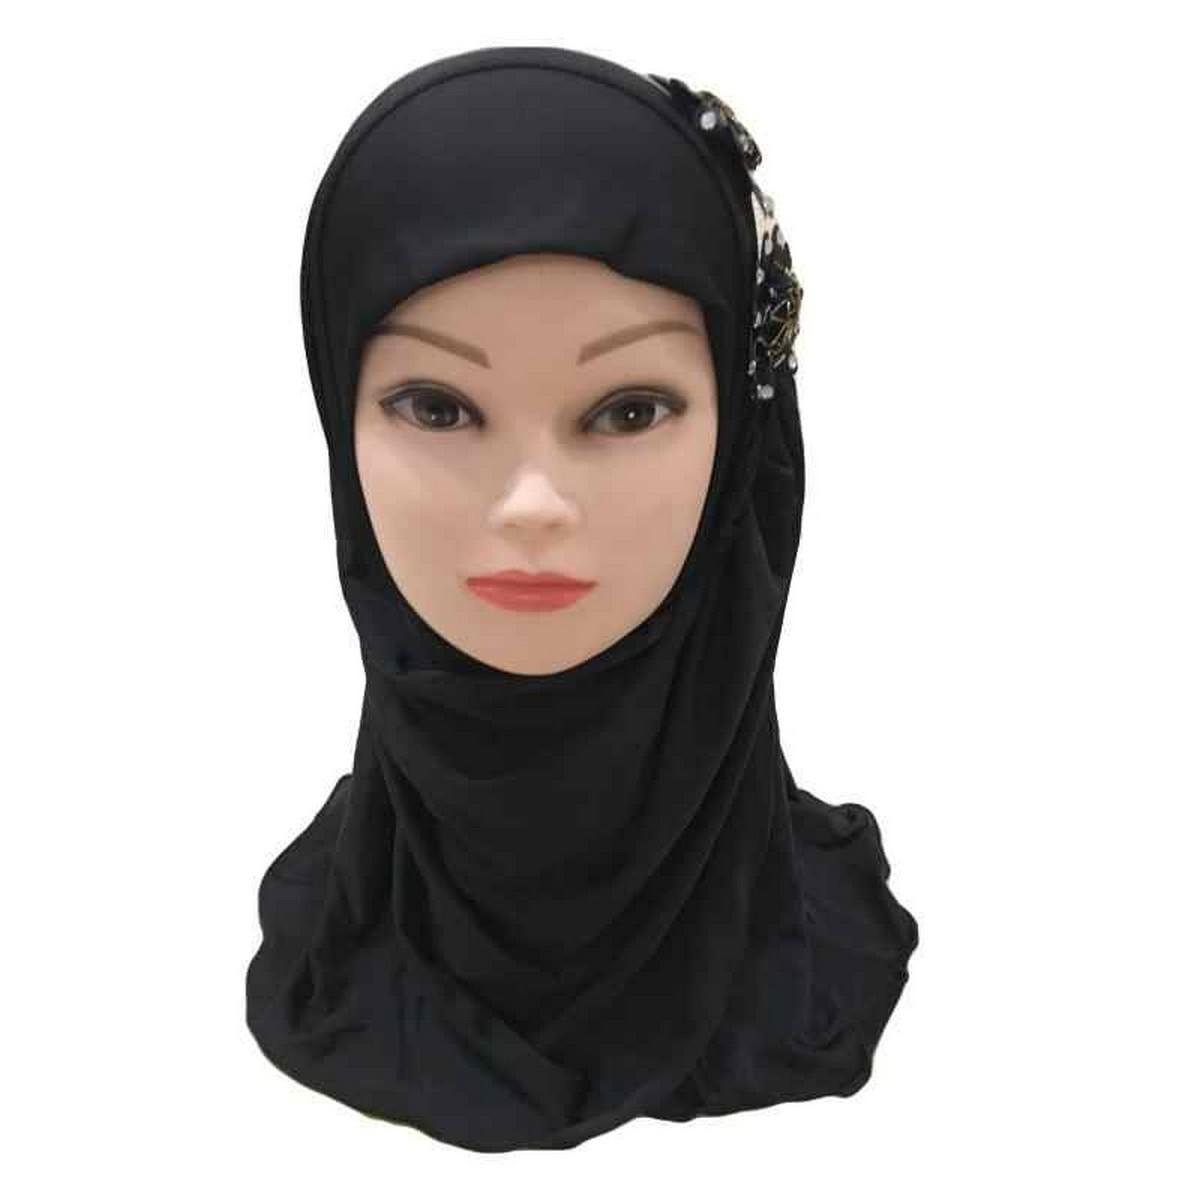 Muslim Kids Girls Hijab Islamic Headscarf Diamontes Flower Scarf One Piece Children Full Cover Makna Wrap Cover 2-7Y